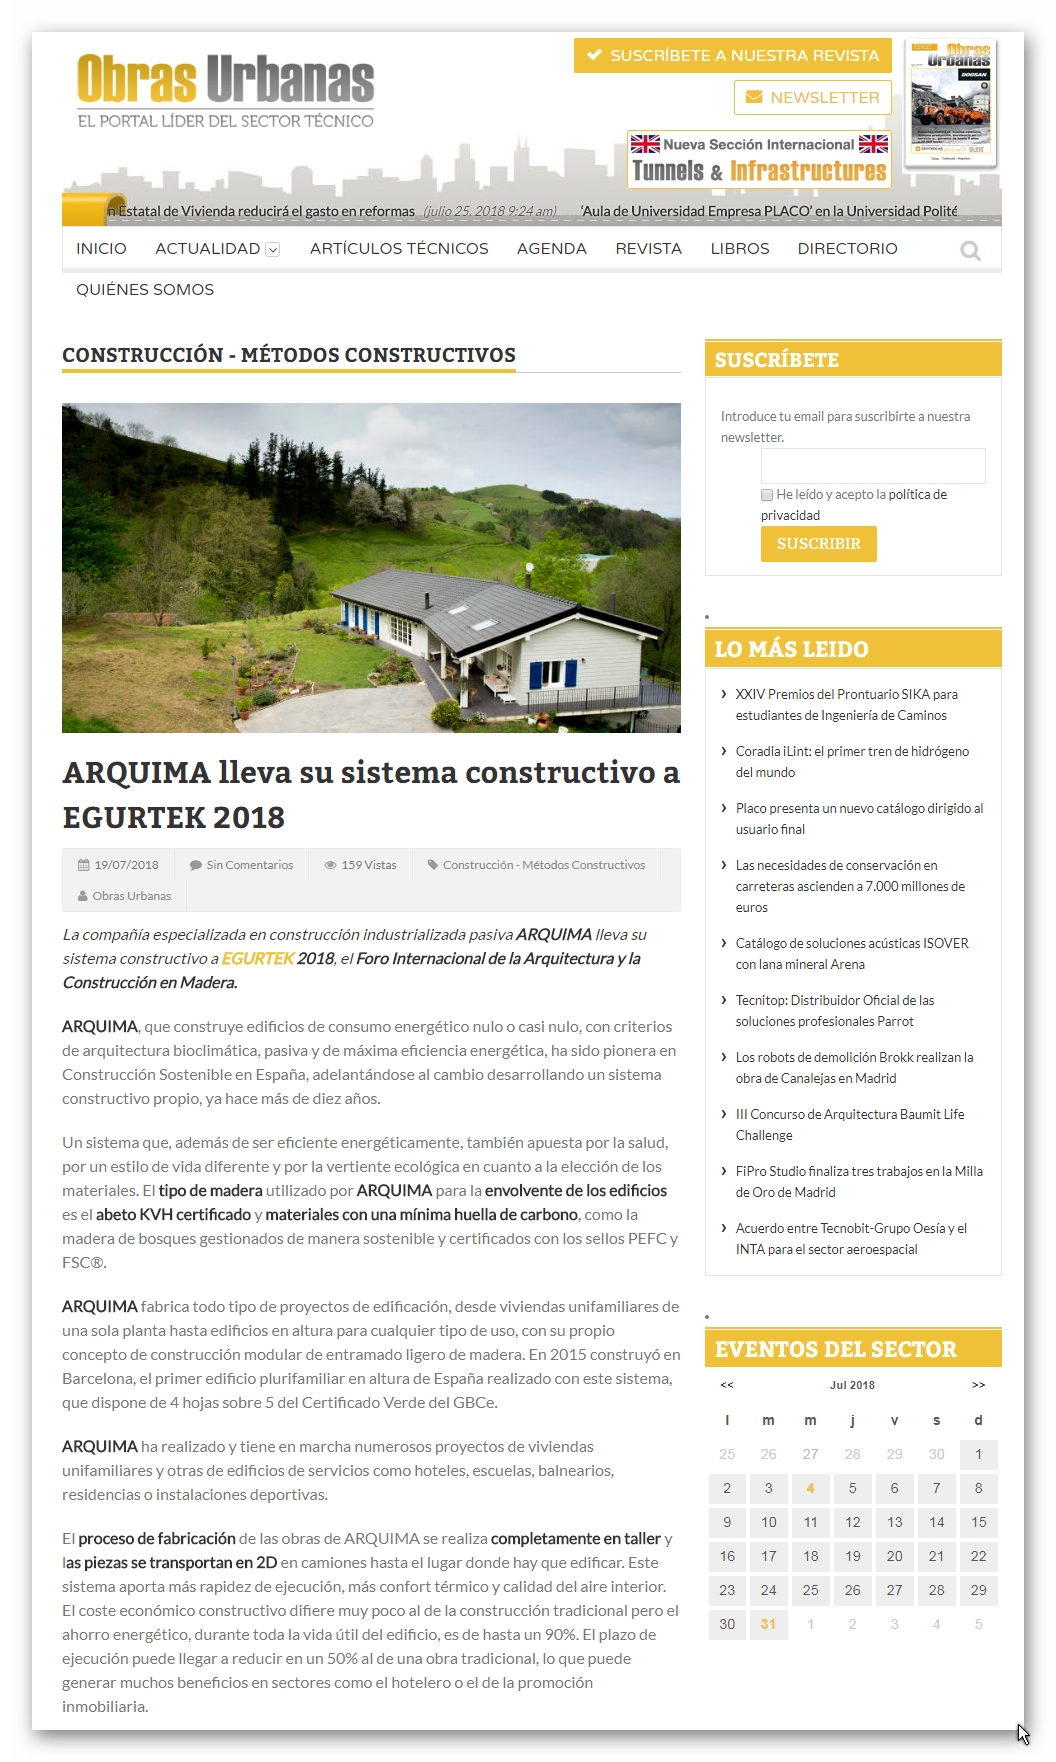 Arquima